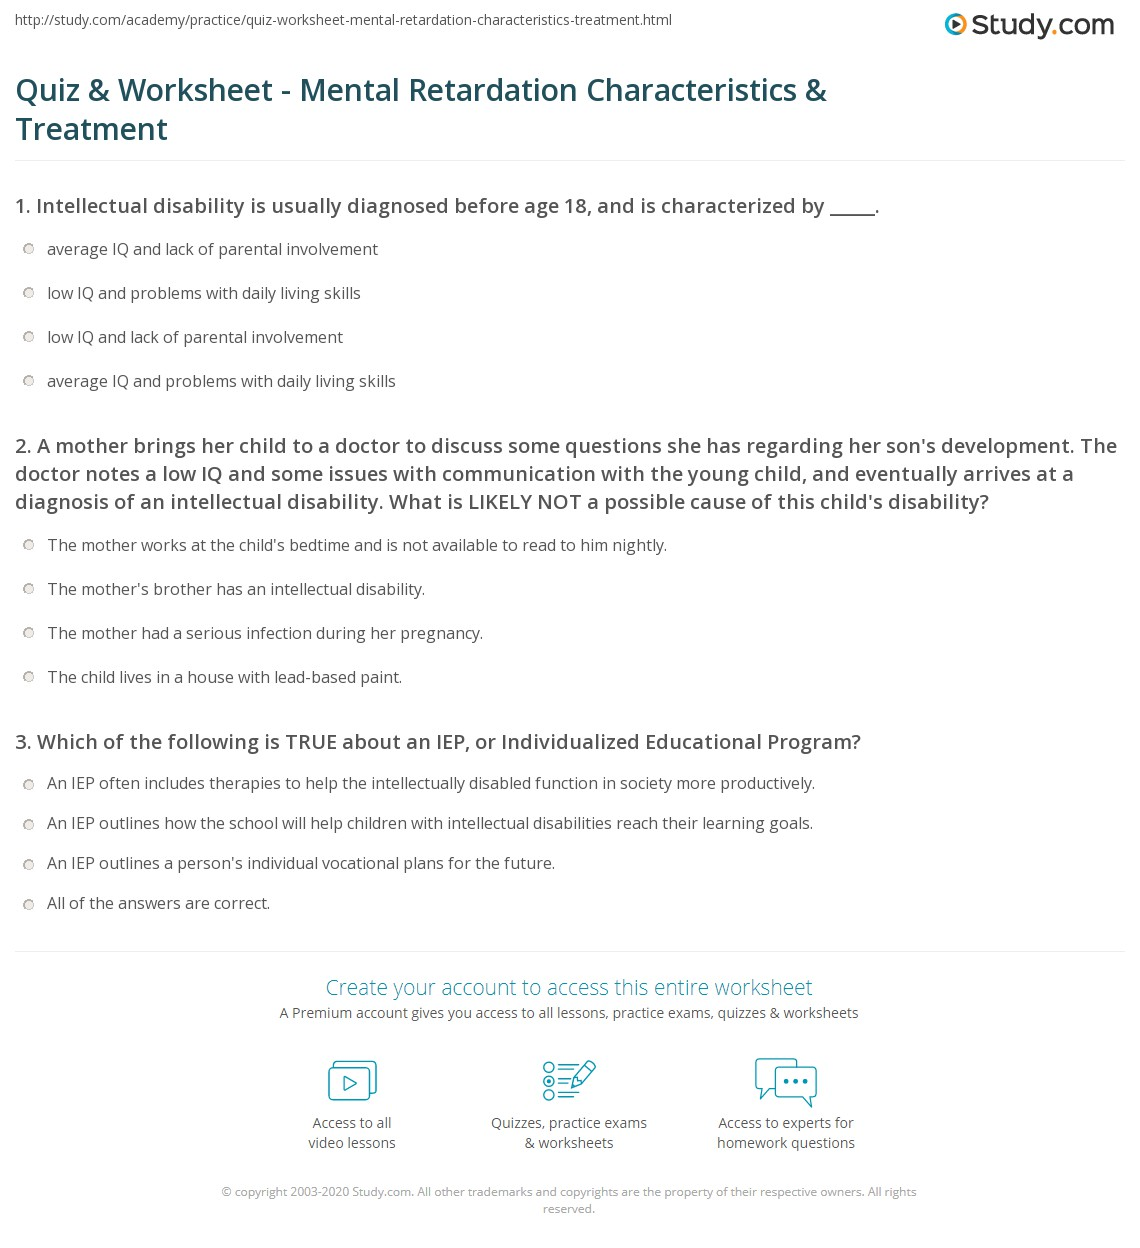 quiz & worksheet - mental retardation characteristics & treatment